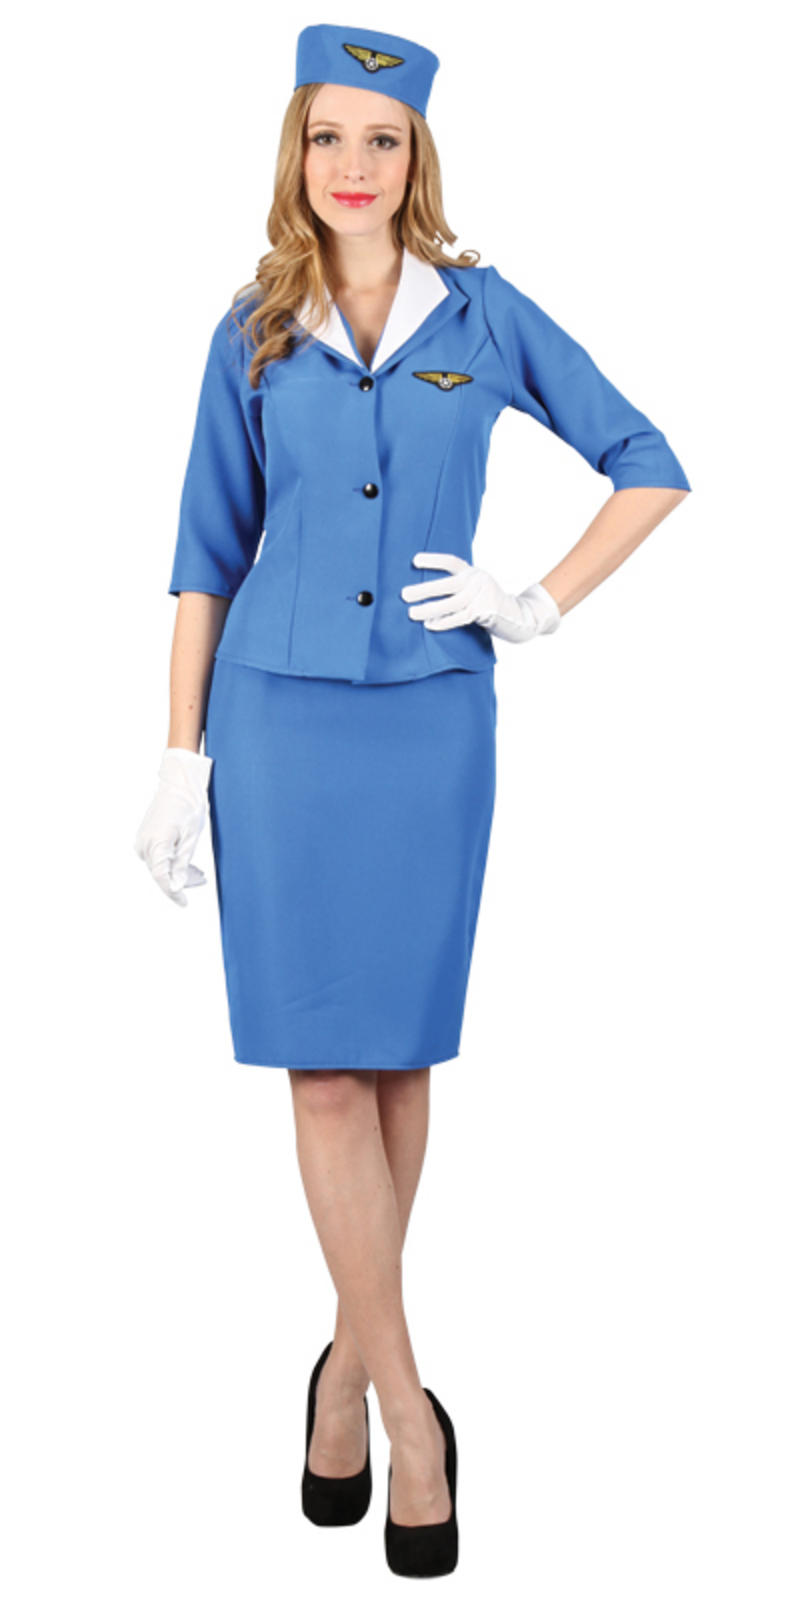 Air Hostess Uniform 58